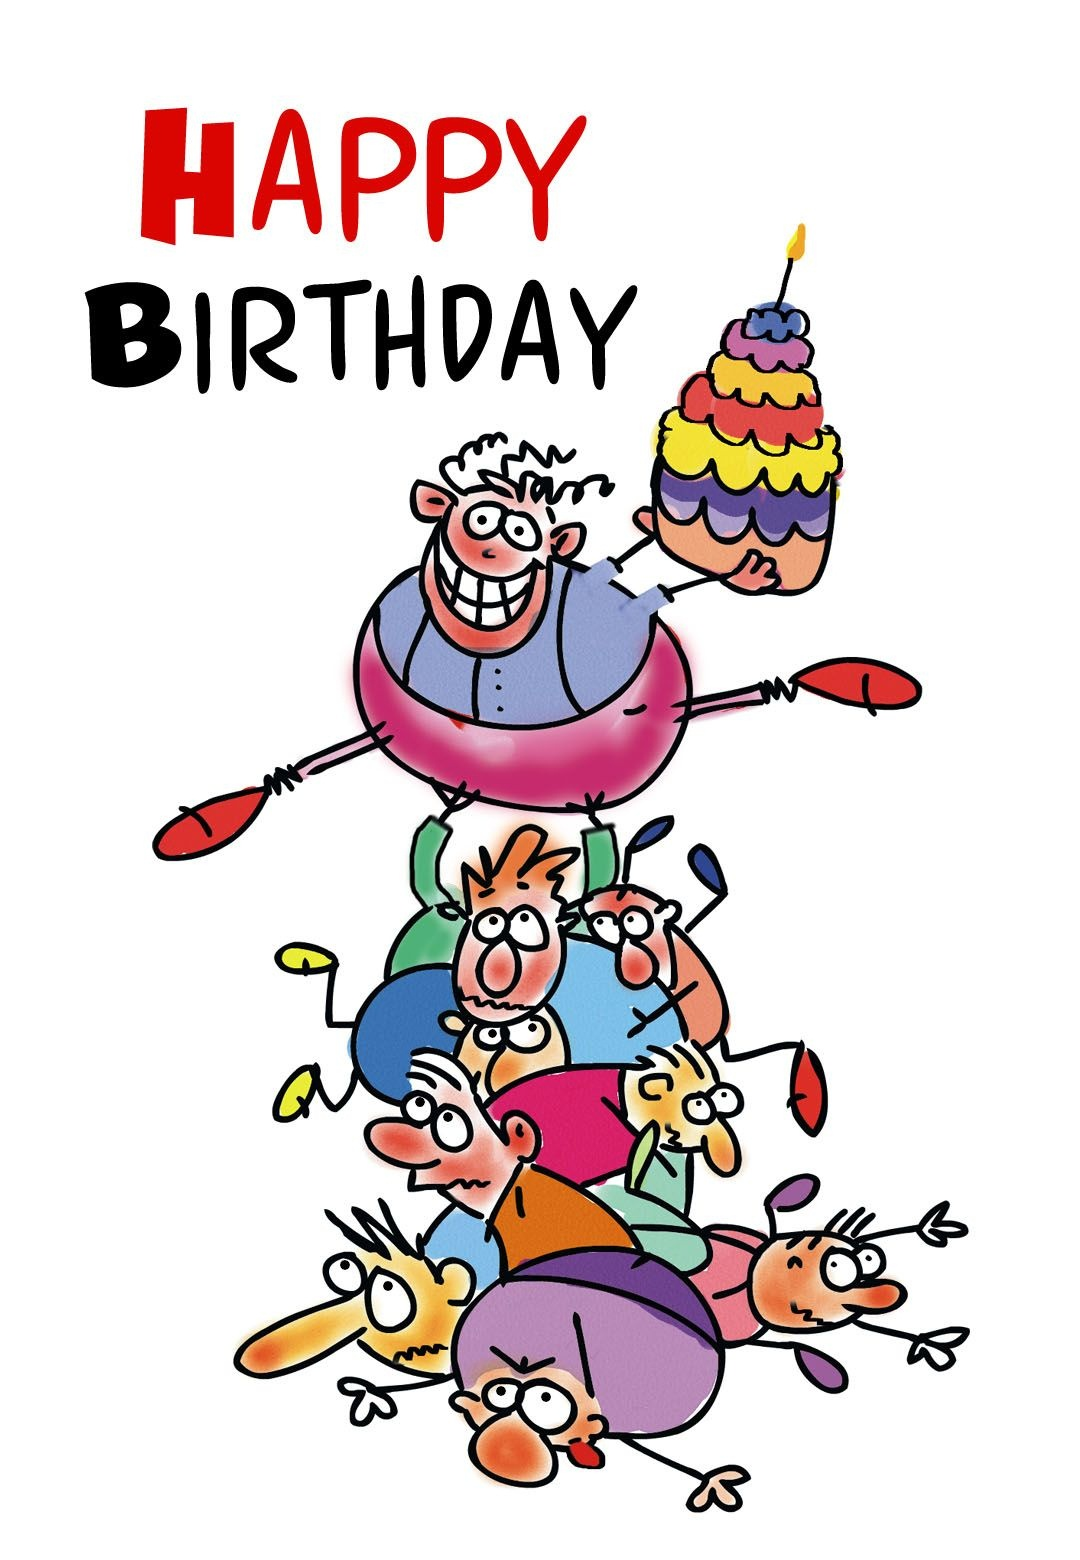 Free Printable Funny Birthday Greeting Card | Gifts To Make | Free - Free Funny Printable Cards